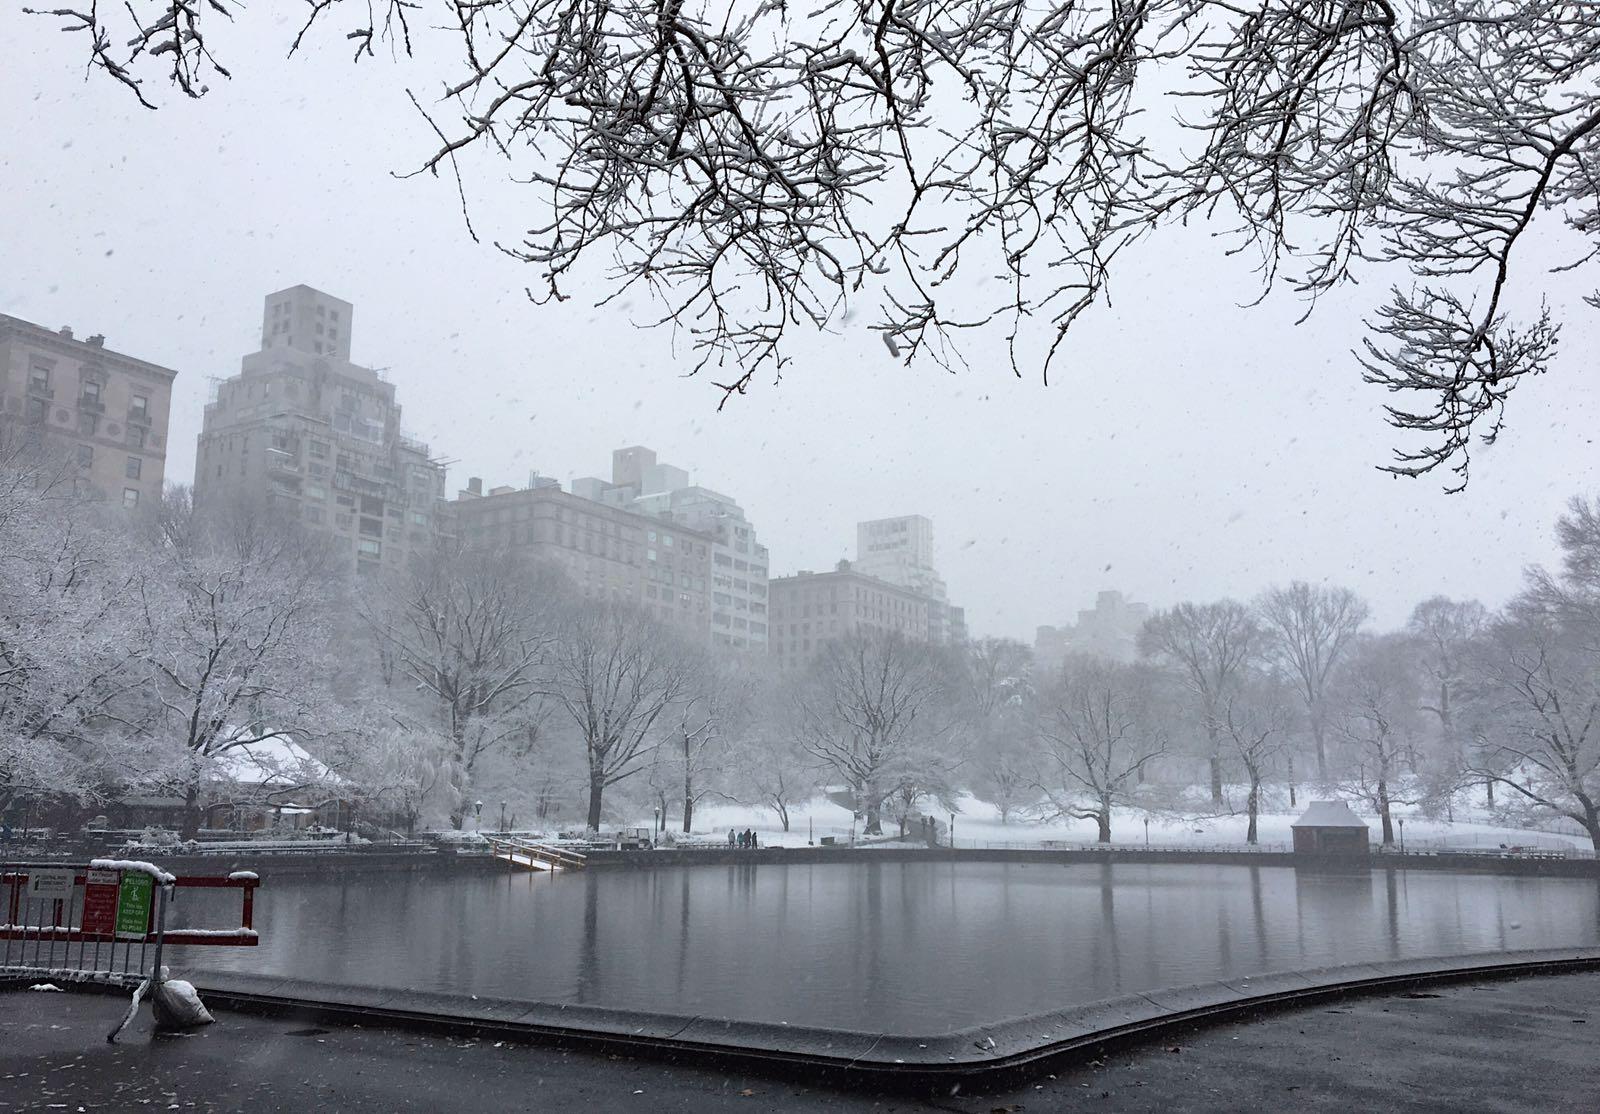 Central Park in New York. (Photo by Ceyda Erdinc)